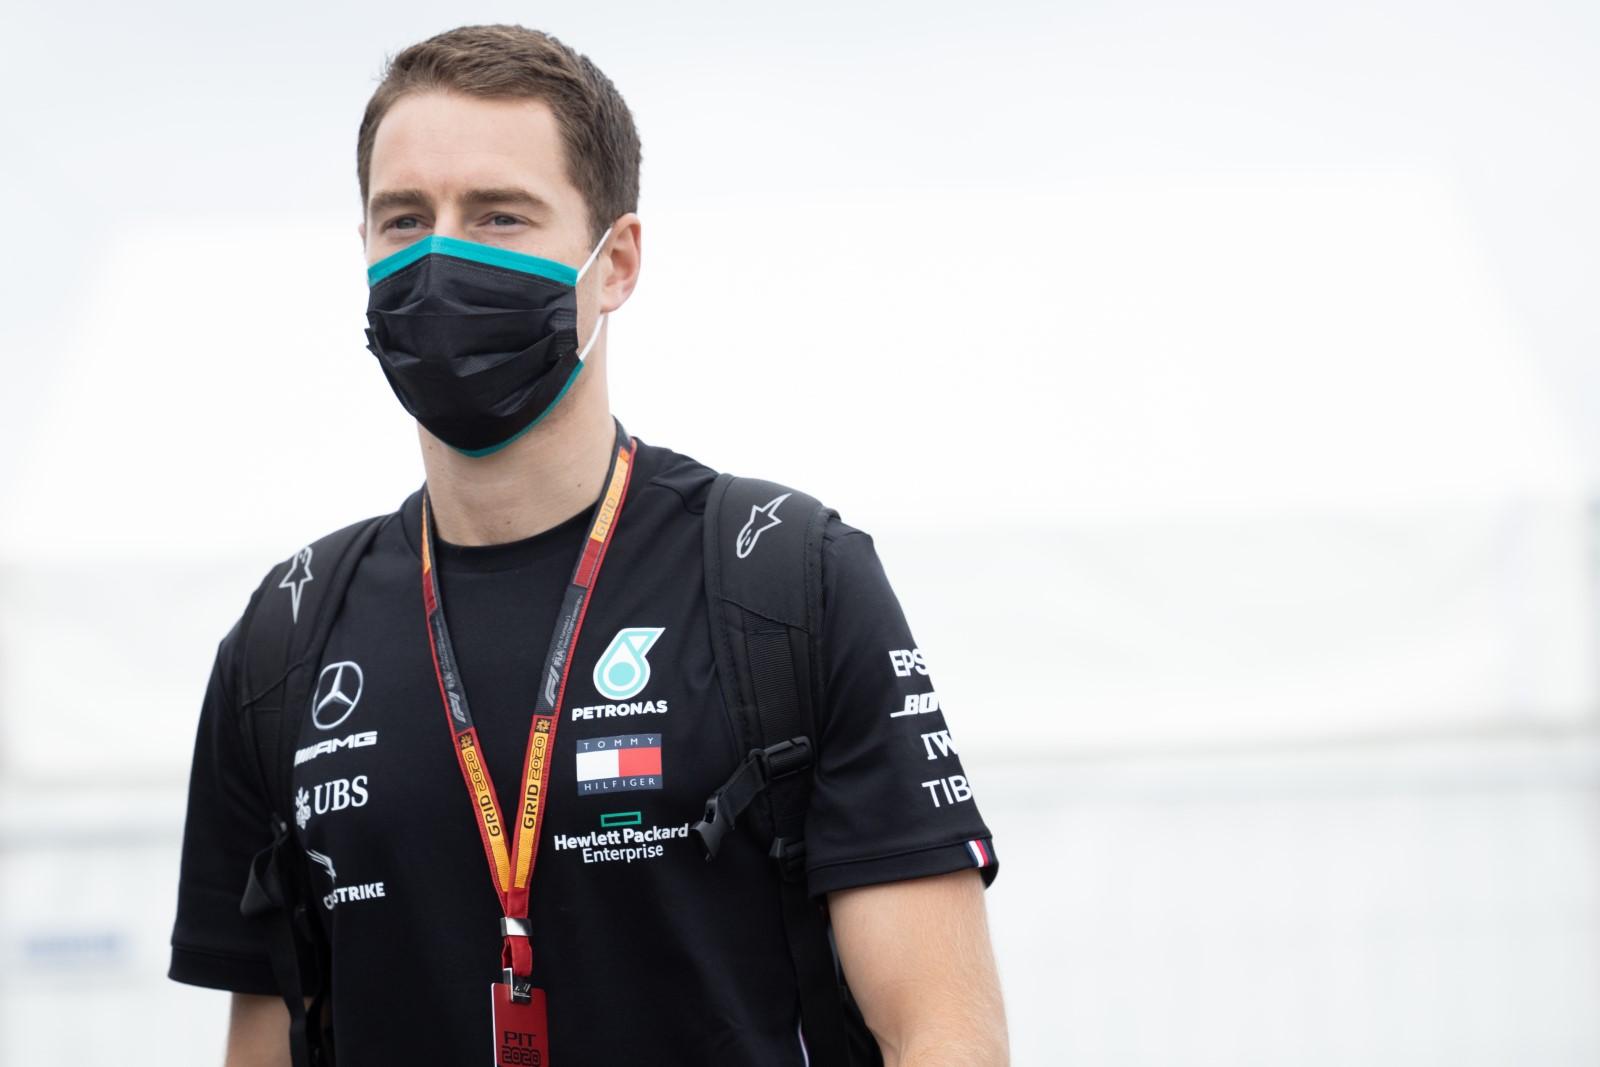 Hulkenberg to stand in for unwell Stroll at Eifel Grand Prix